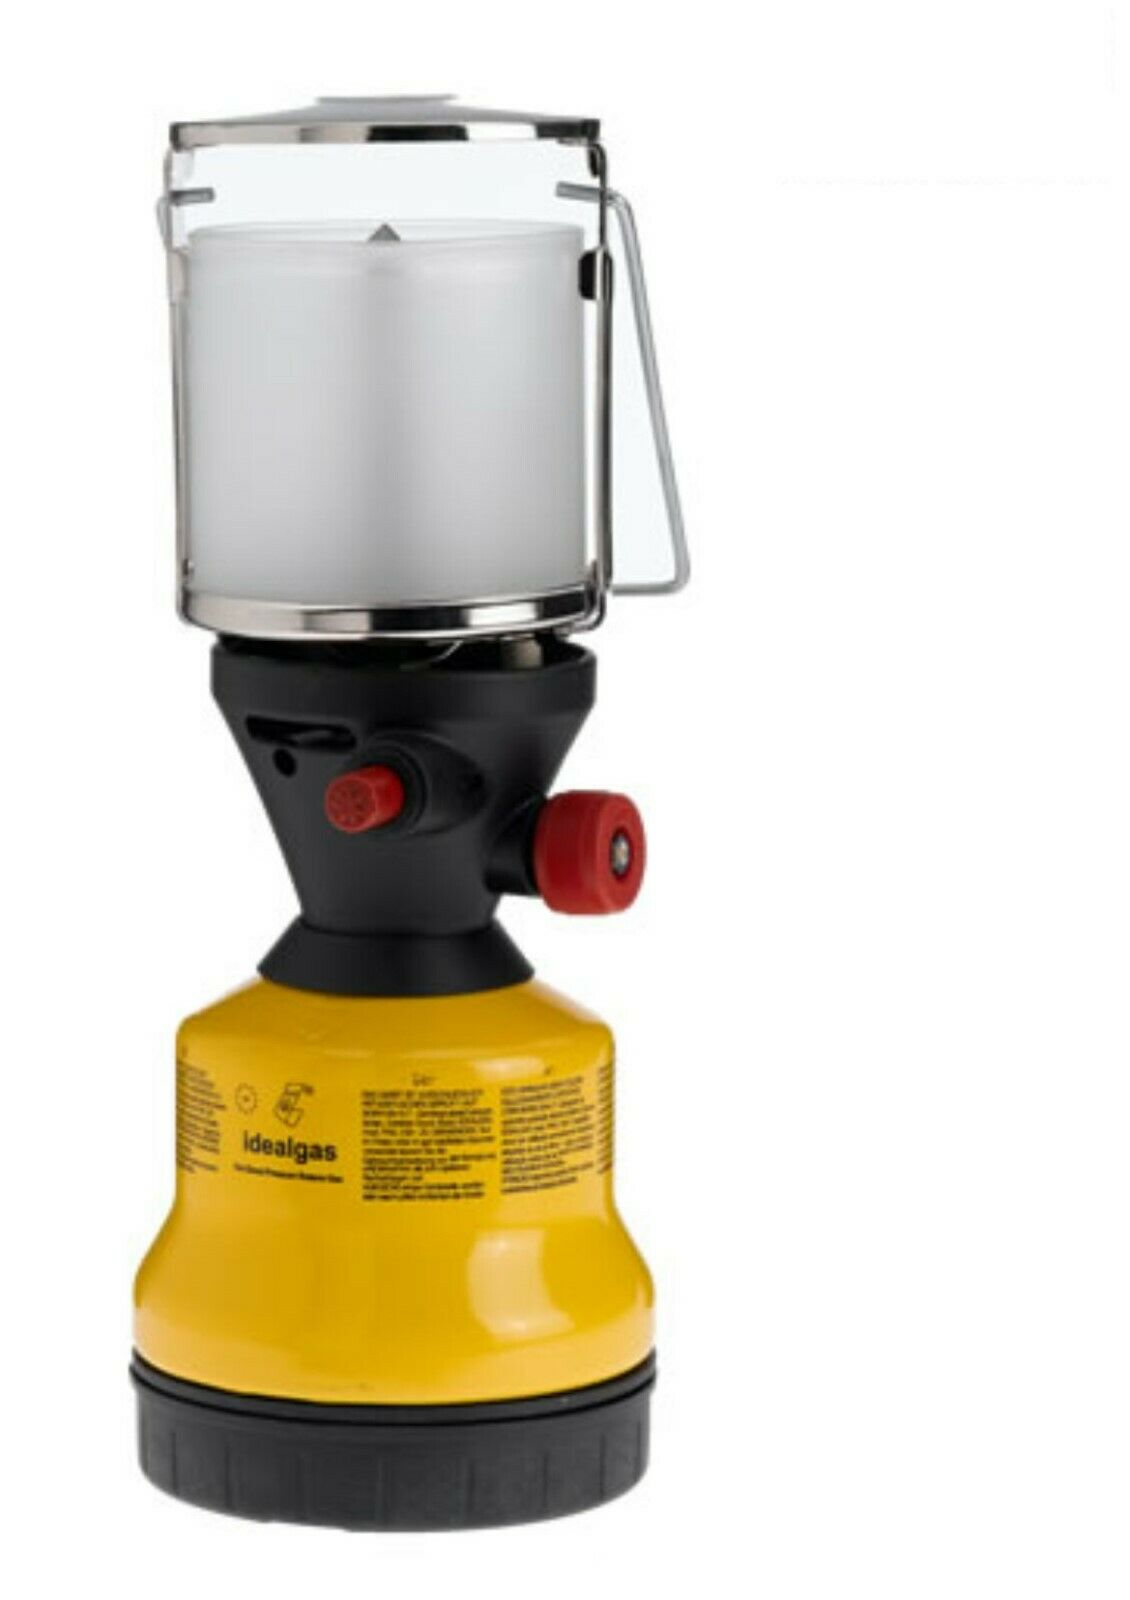 Gaslampe Campinglampe MIT PIEZOZÜNDER Campingleuchte IDEALGAS-Laterne  950040600  | Wunderbar